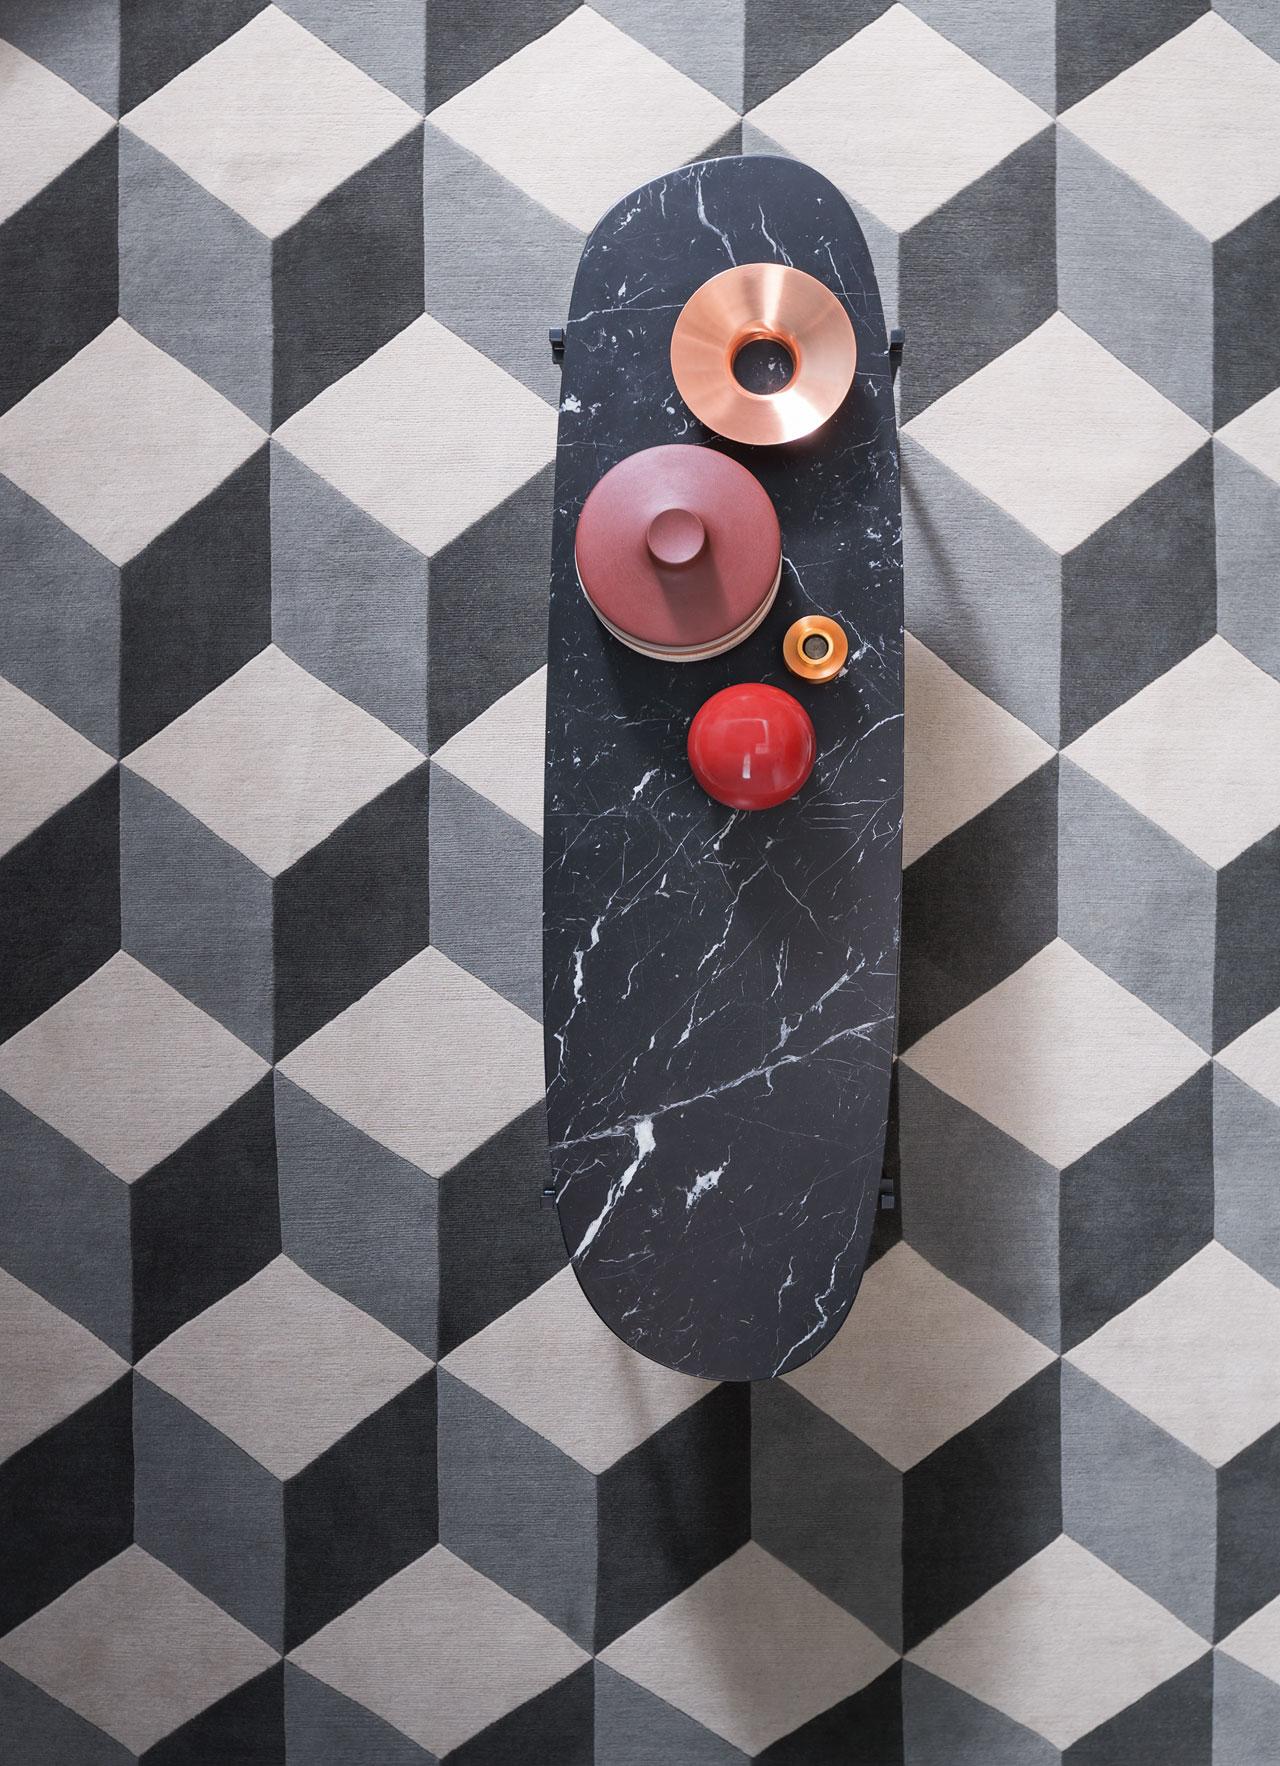 Niobe small tableswith black Marquinia Carrara orEmperadormarble topsdesigned by Federica Capitani for Zanotta.Set Design, styling: Studio Salaris, Photo: Beppe Brancato & Leo Torri. Photo courtesy of Zanotta, 2016.